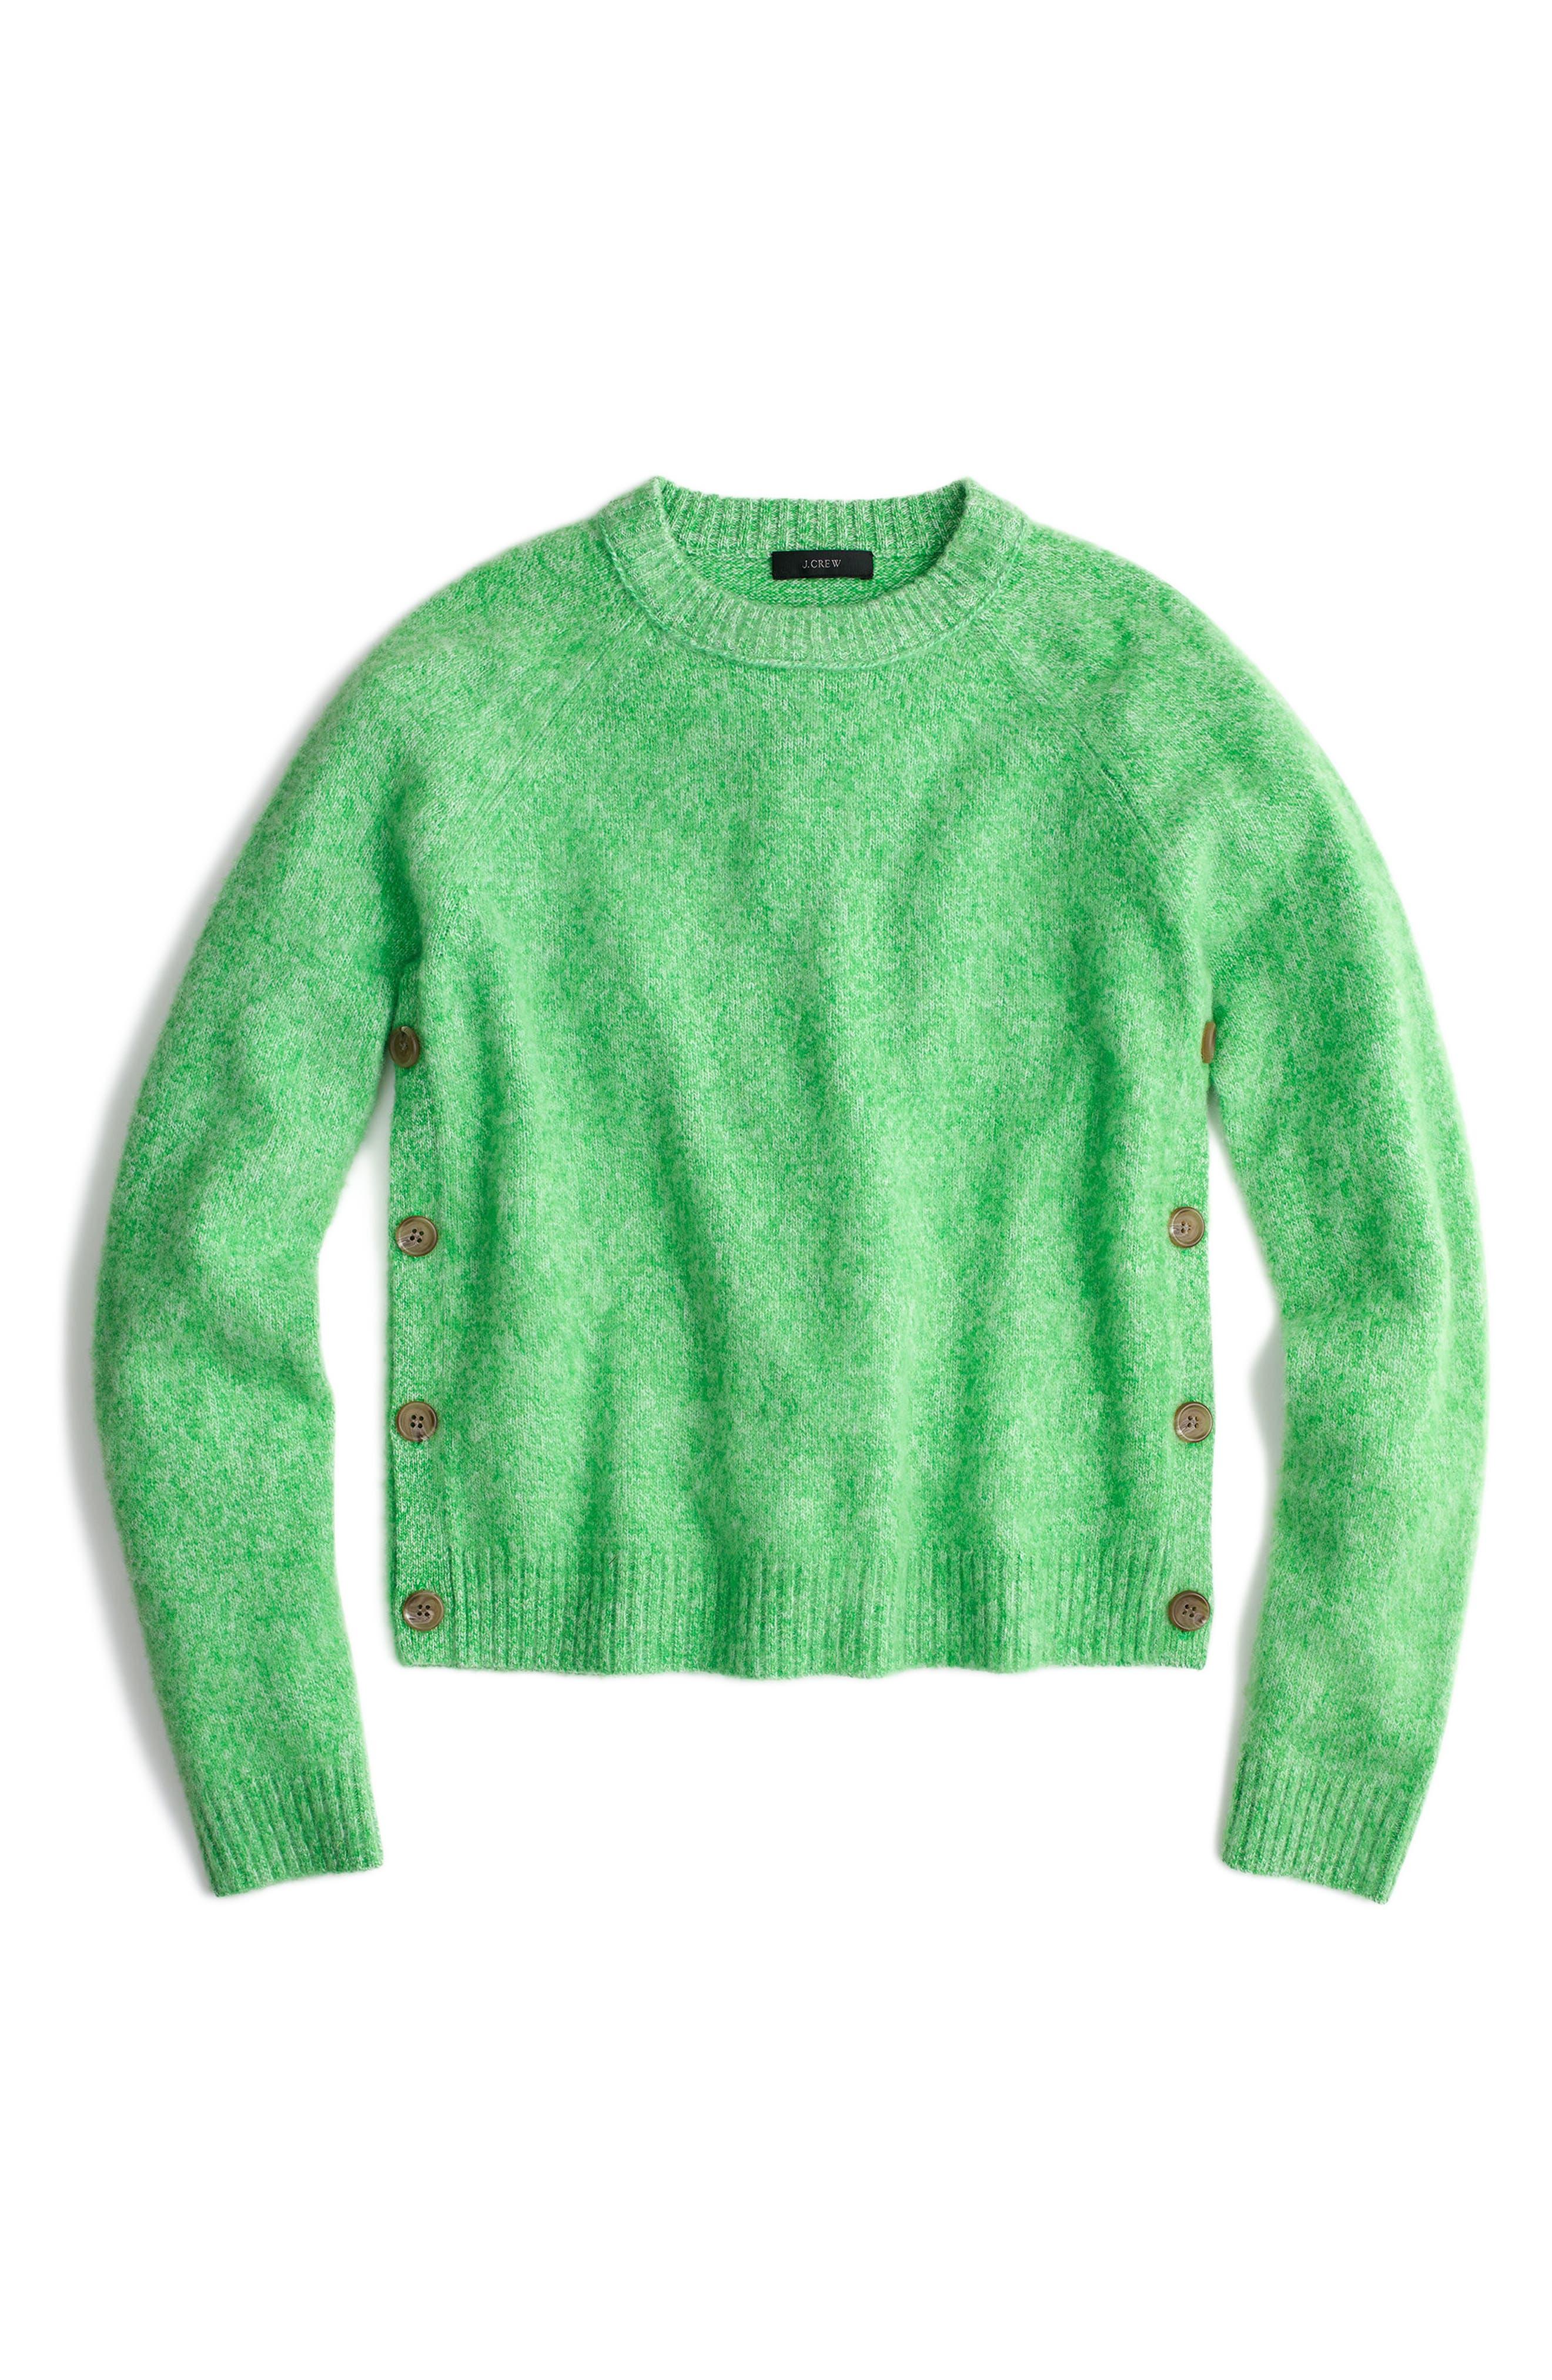 J.Crew Brushed Shrunken Lambswool Crewneck Sweater,                         Main,                         color, Marled Clover